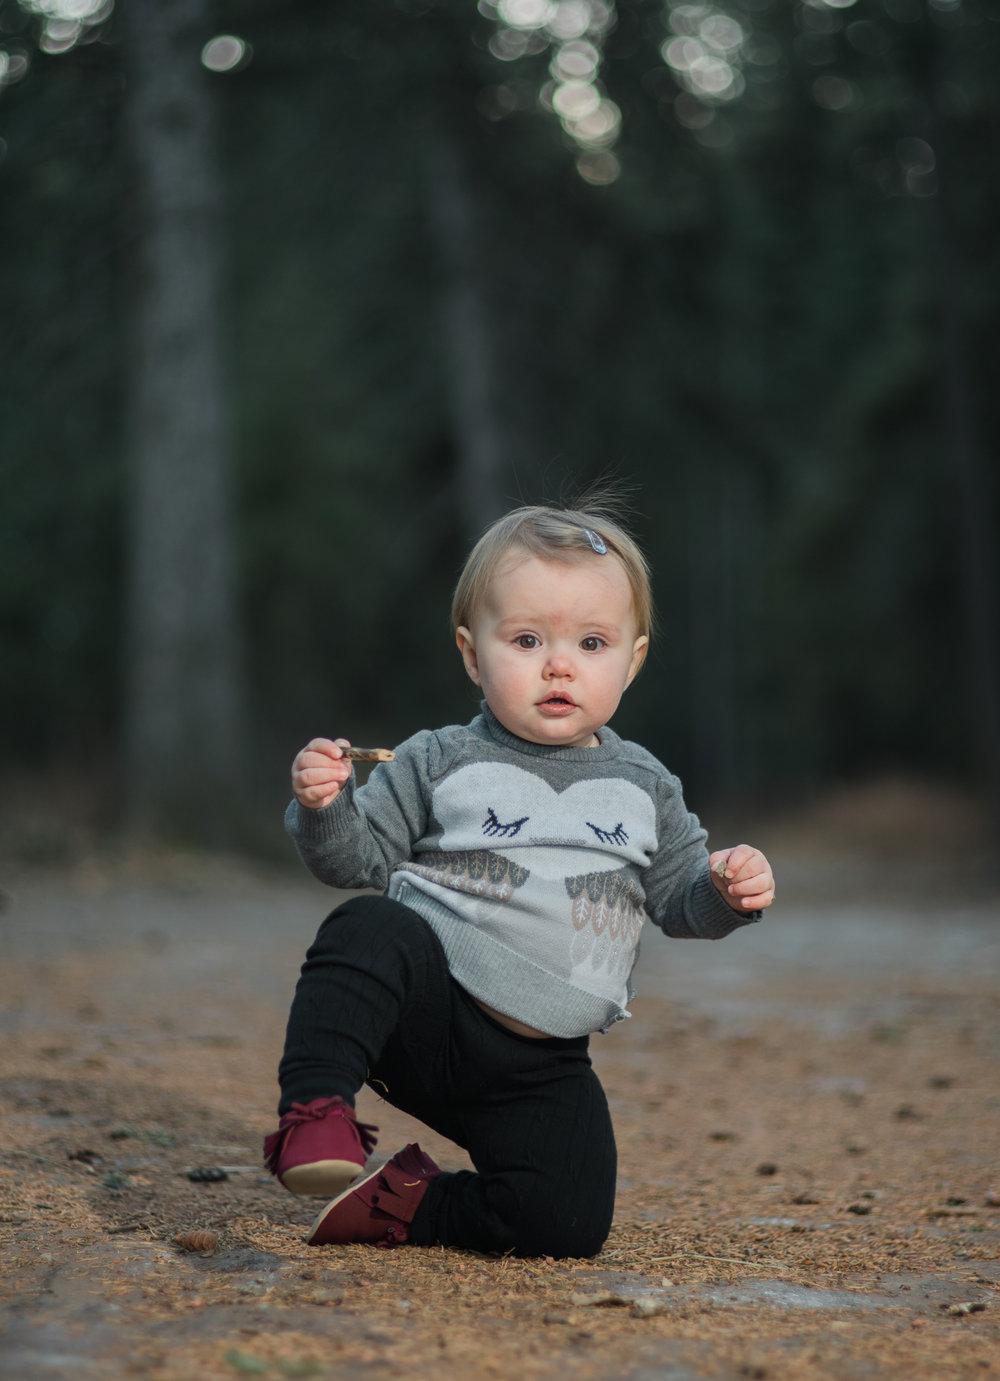 Calgary family photographyhttps://www.facebook.com/culturedphotographs/